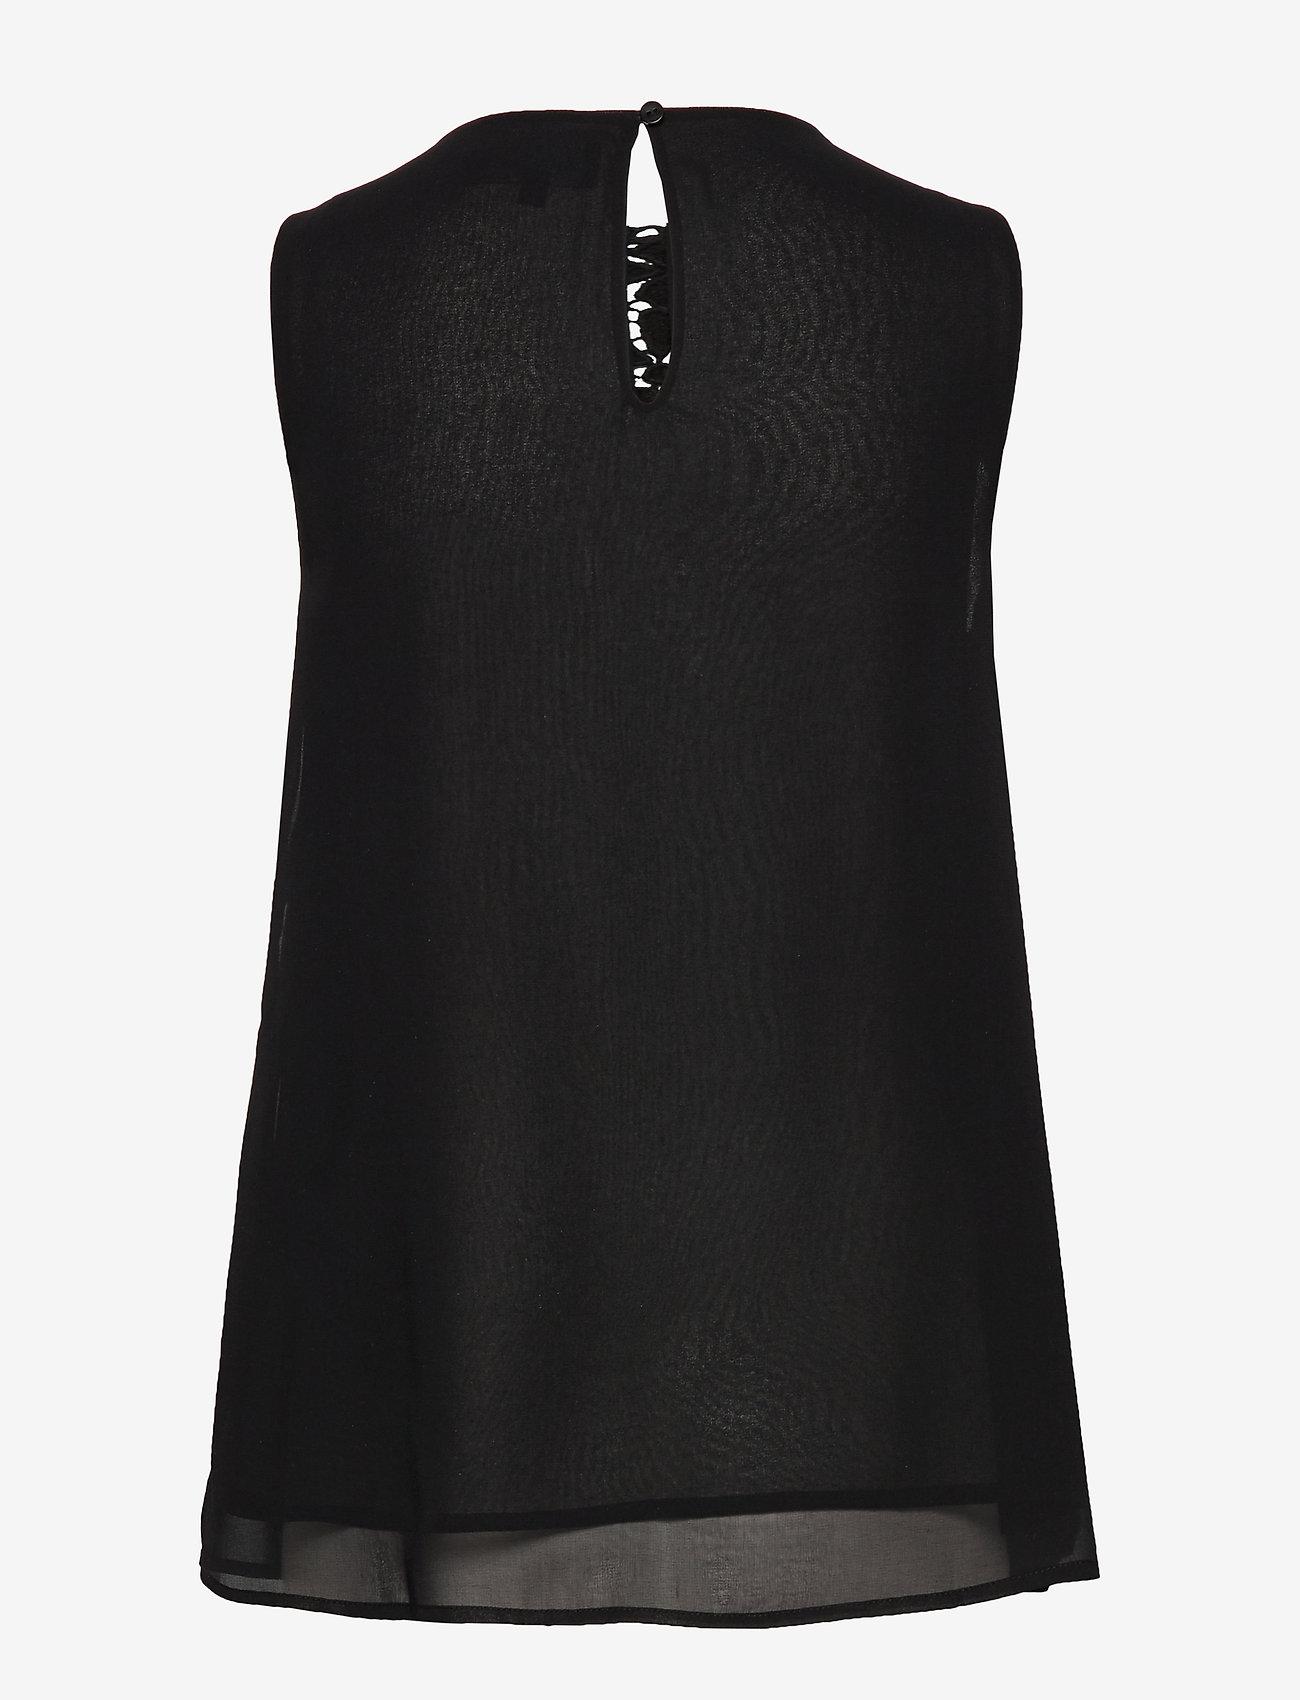 Blus Tebas (Negro) (389.35 kr) - Desigual